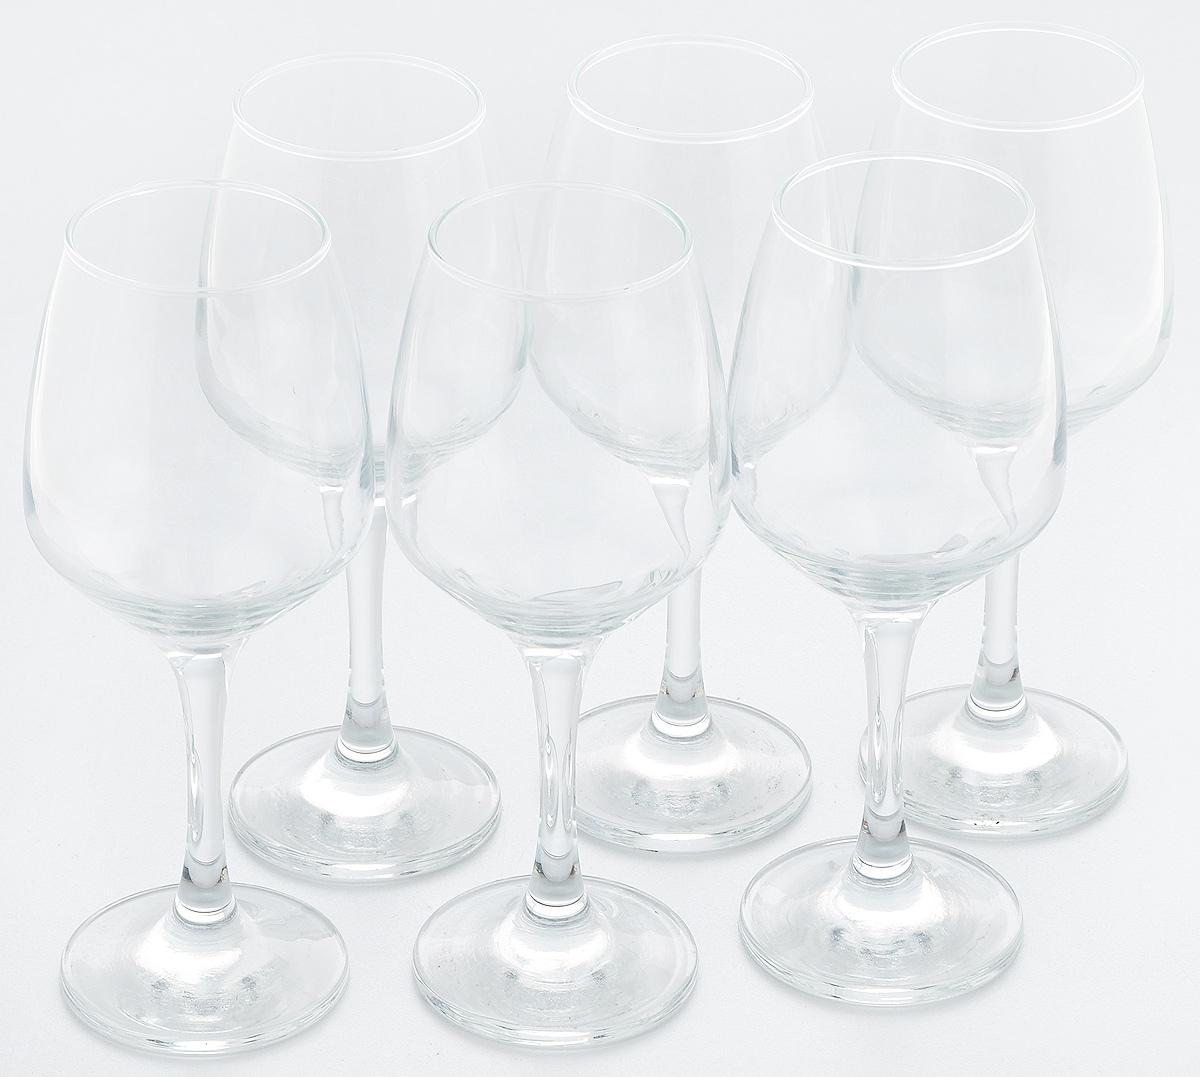 Набор бокалов для вина Pasabahce Isabella, 400 мл, 6 шт набор бокалов pasabahce isabella 65 мл 6 шт